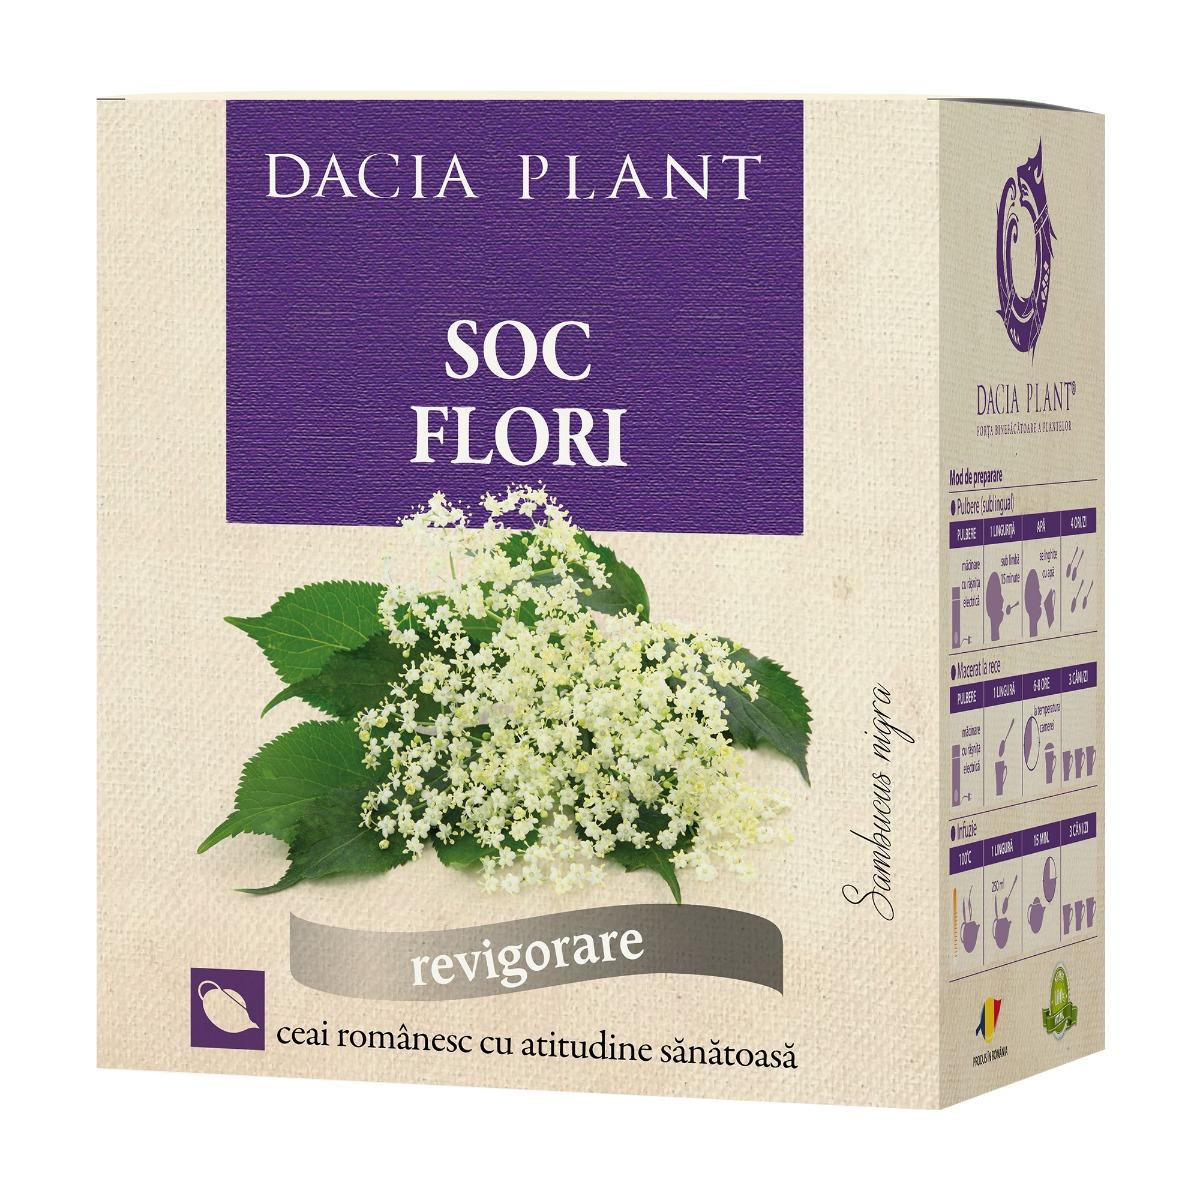 Ceai flori de soc, 50g, Dacia Plant drmax.ro